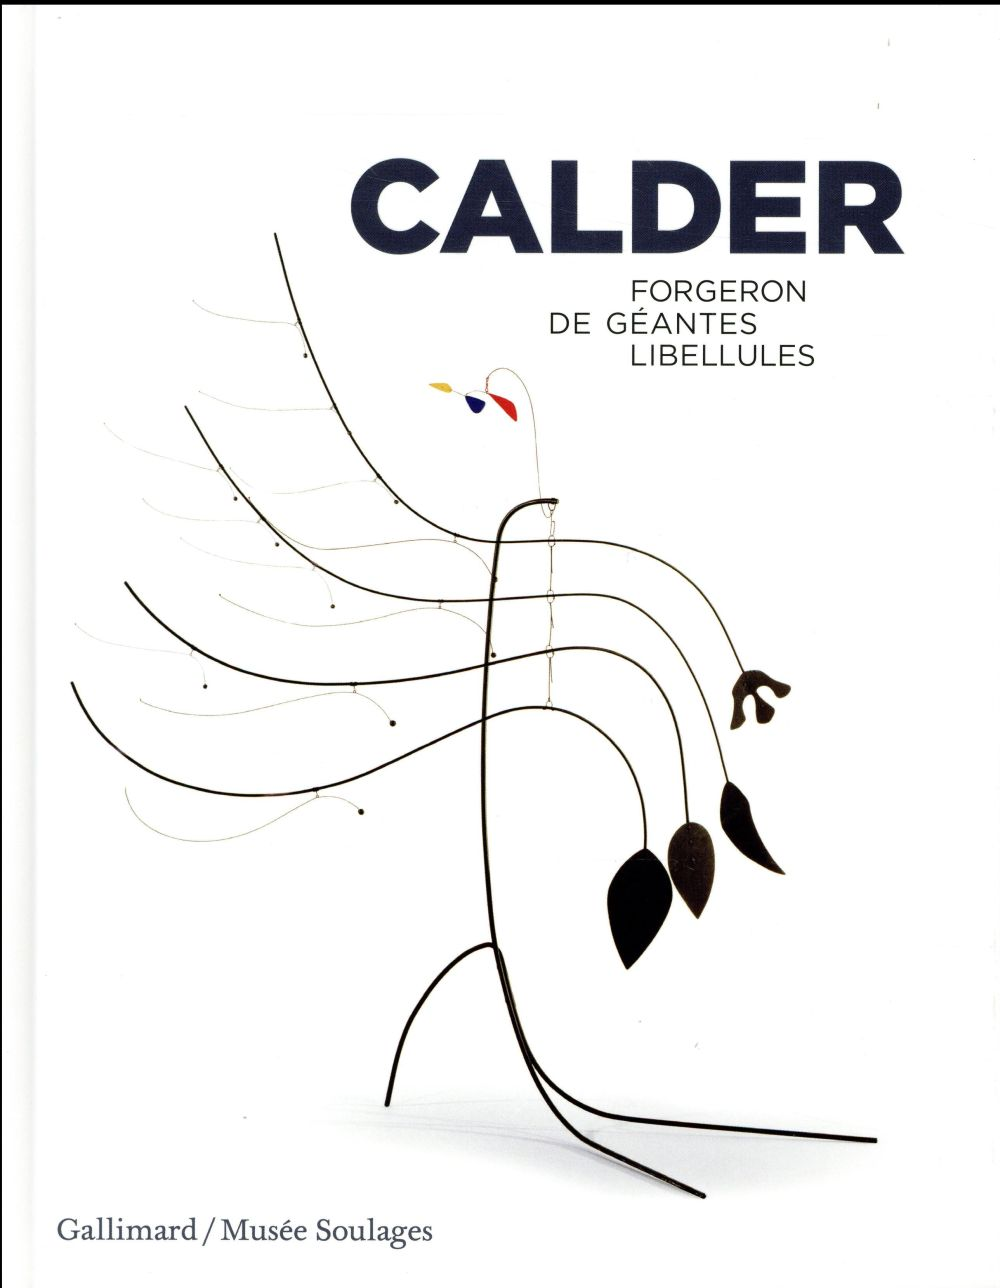 Calder ; forgeron de géantes libellules